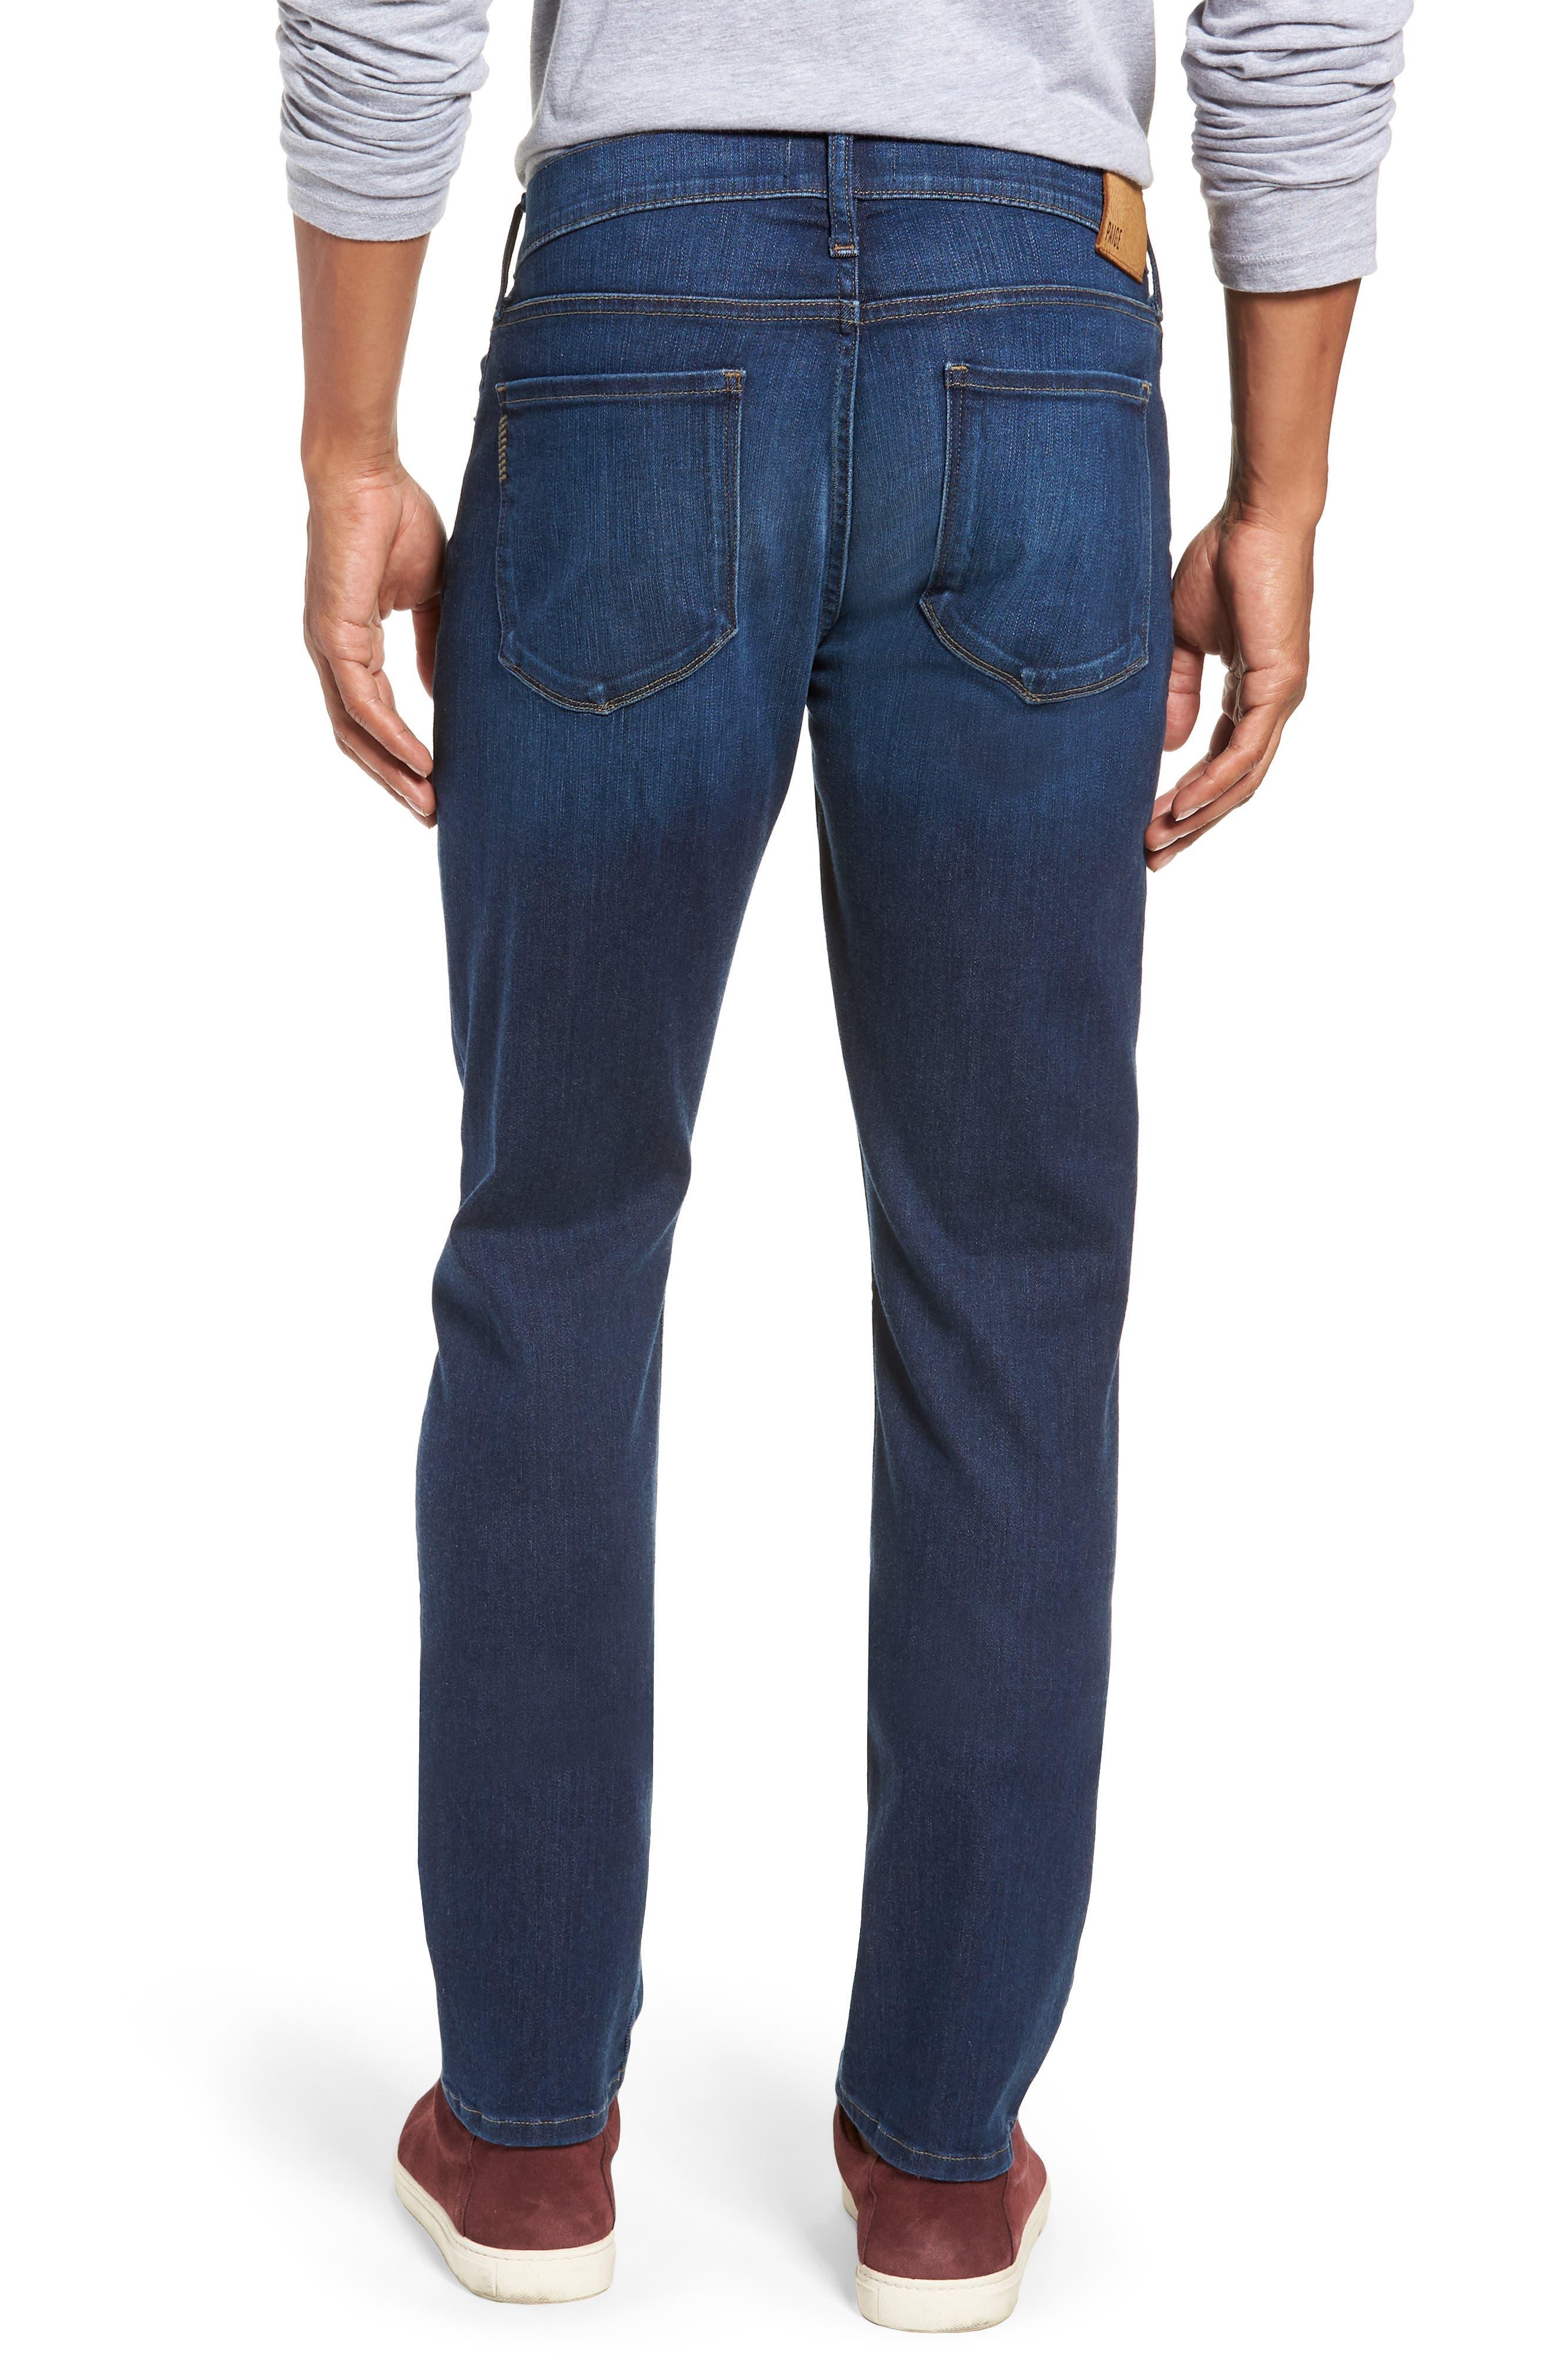 Transcend Vintage - Federal Slim Straight Leg Jeans,                             Alternate thumbnail 2, color,                             ELWYN